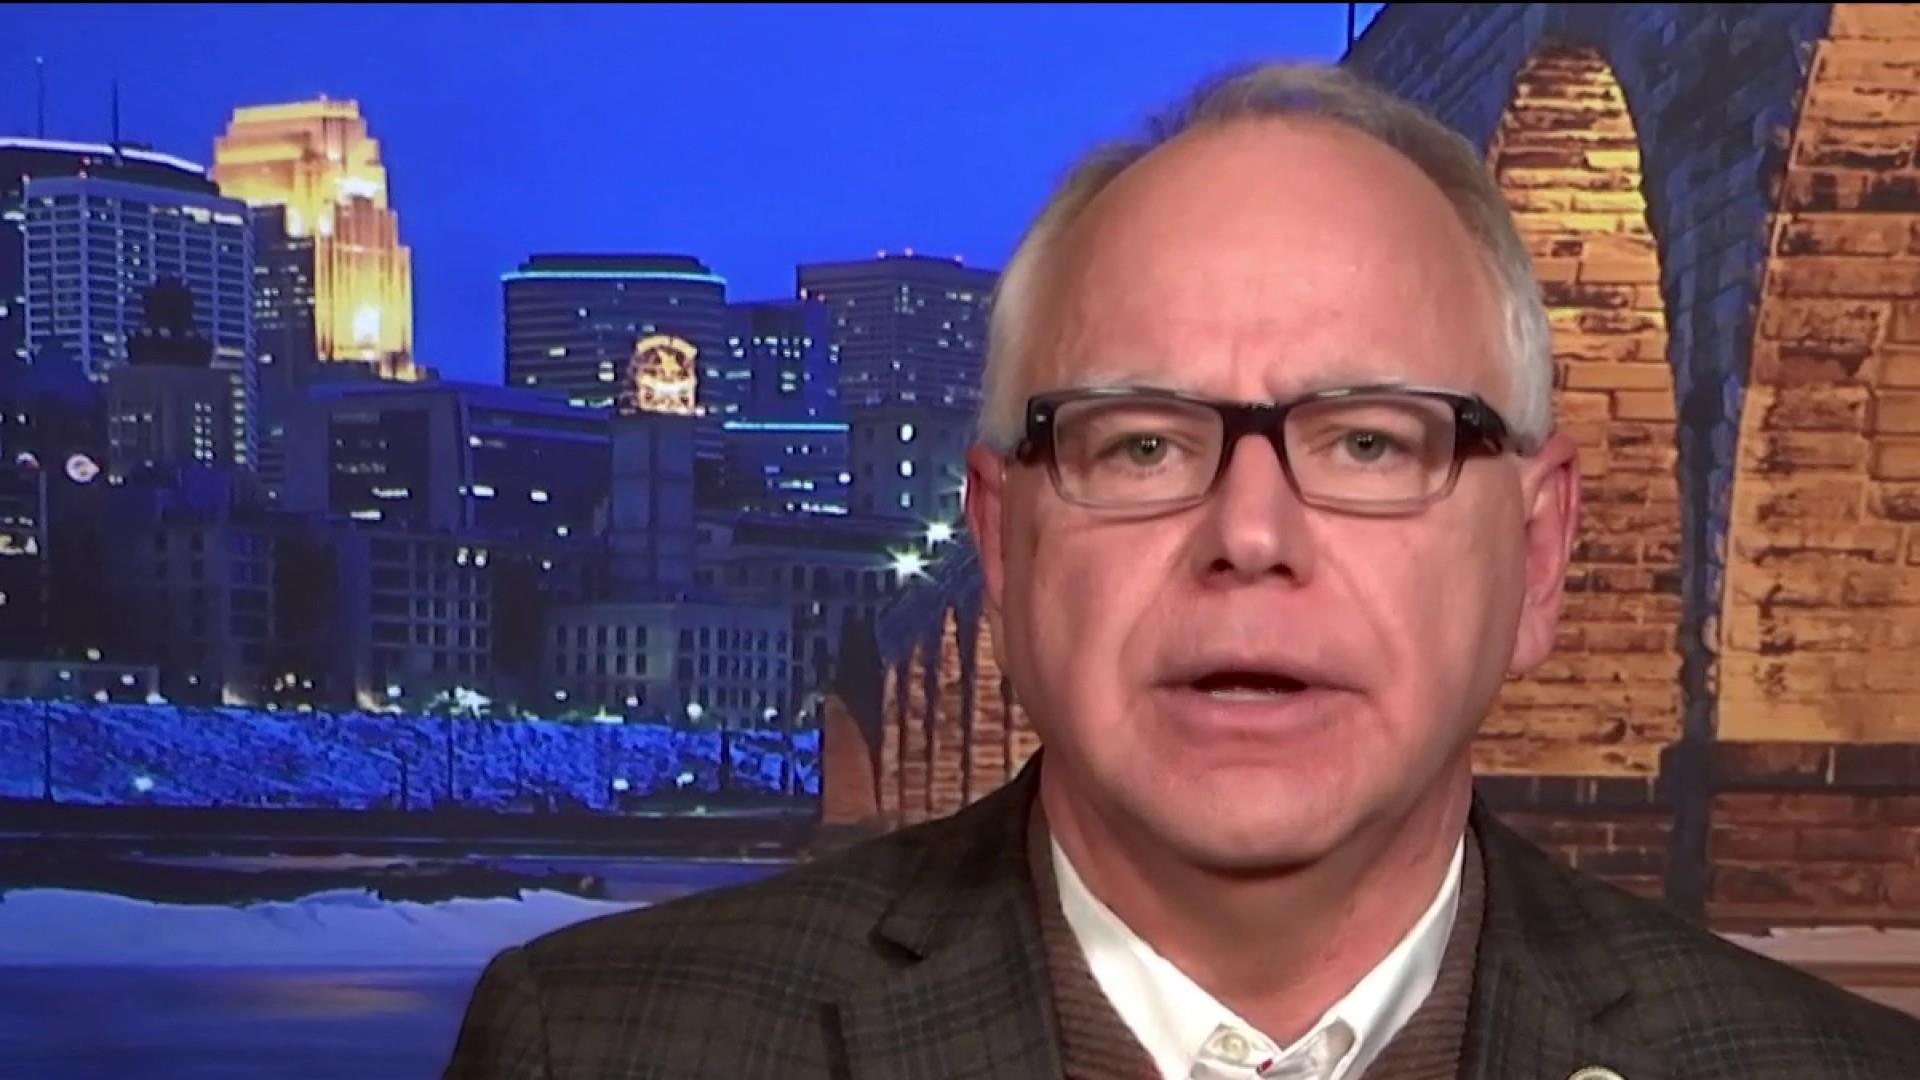 Veteran congressman: Military parade 'stupidest thing I've ever heard'